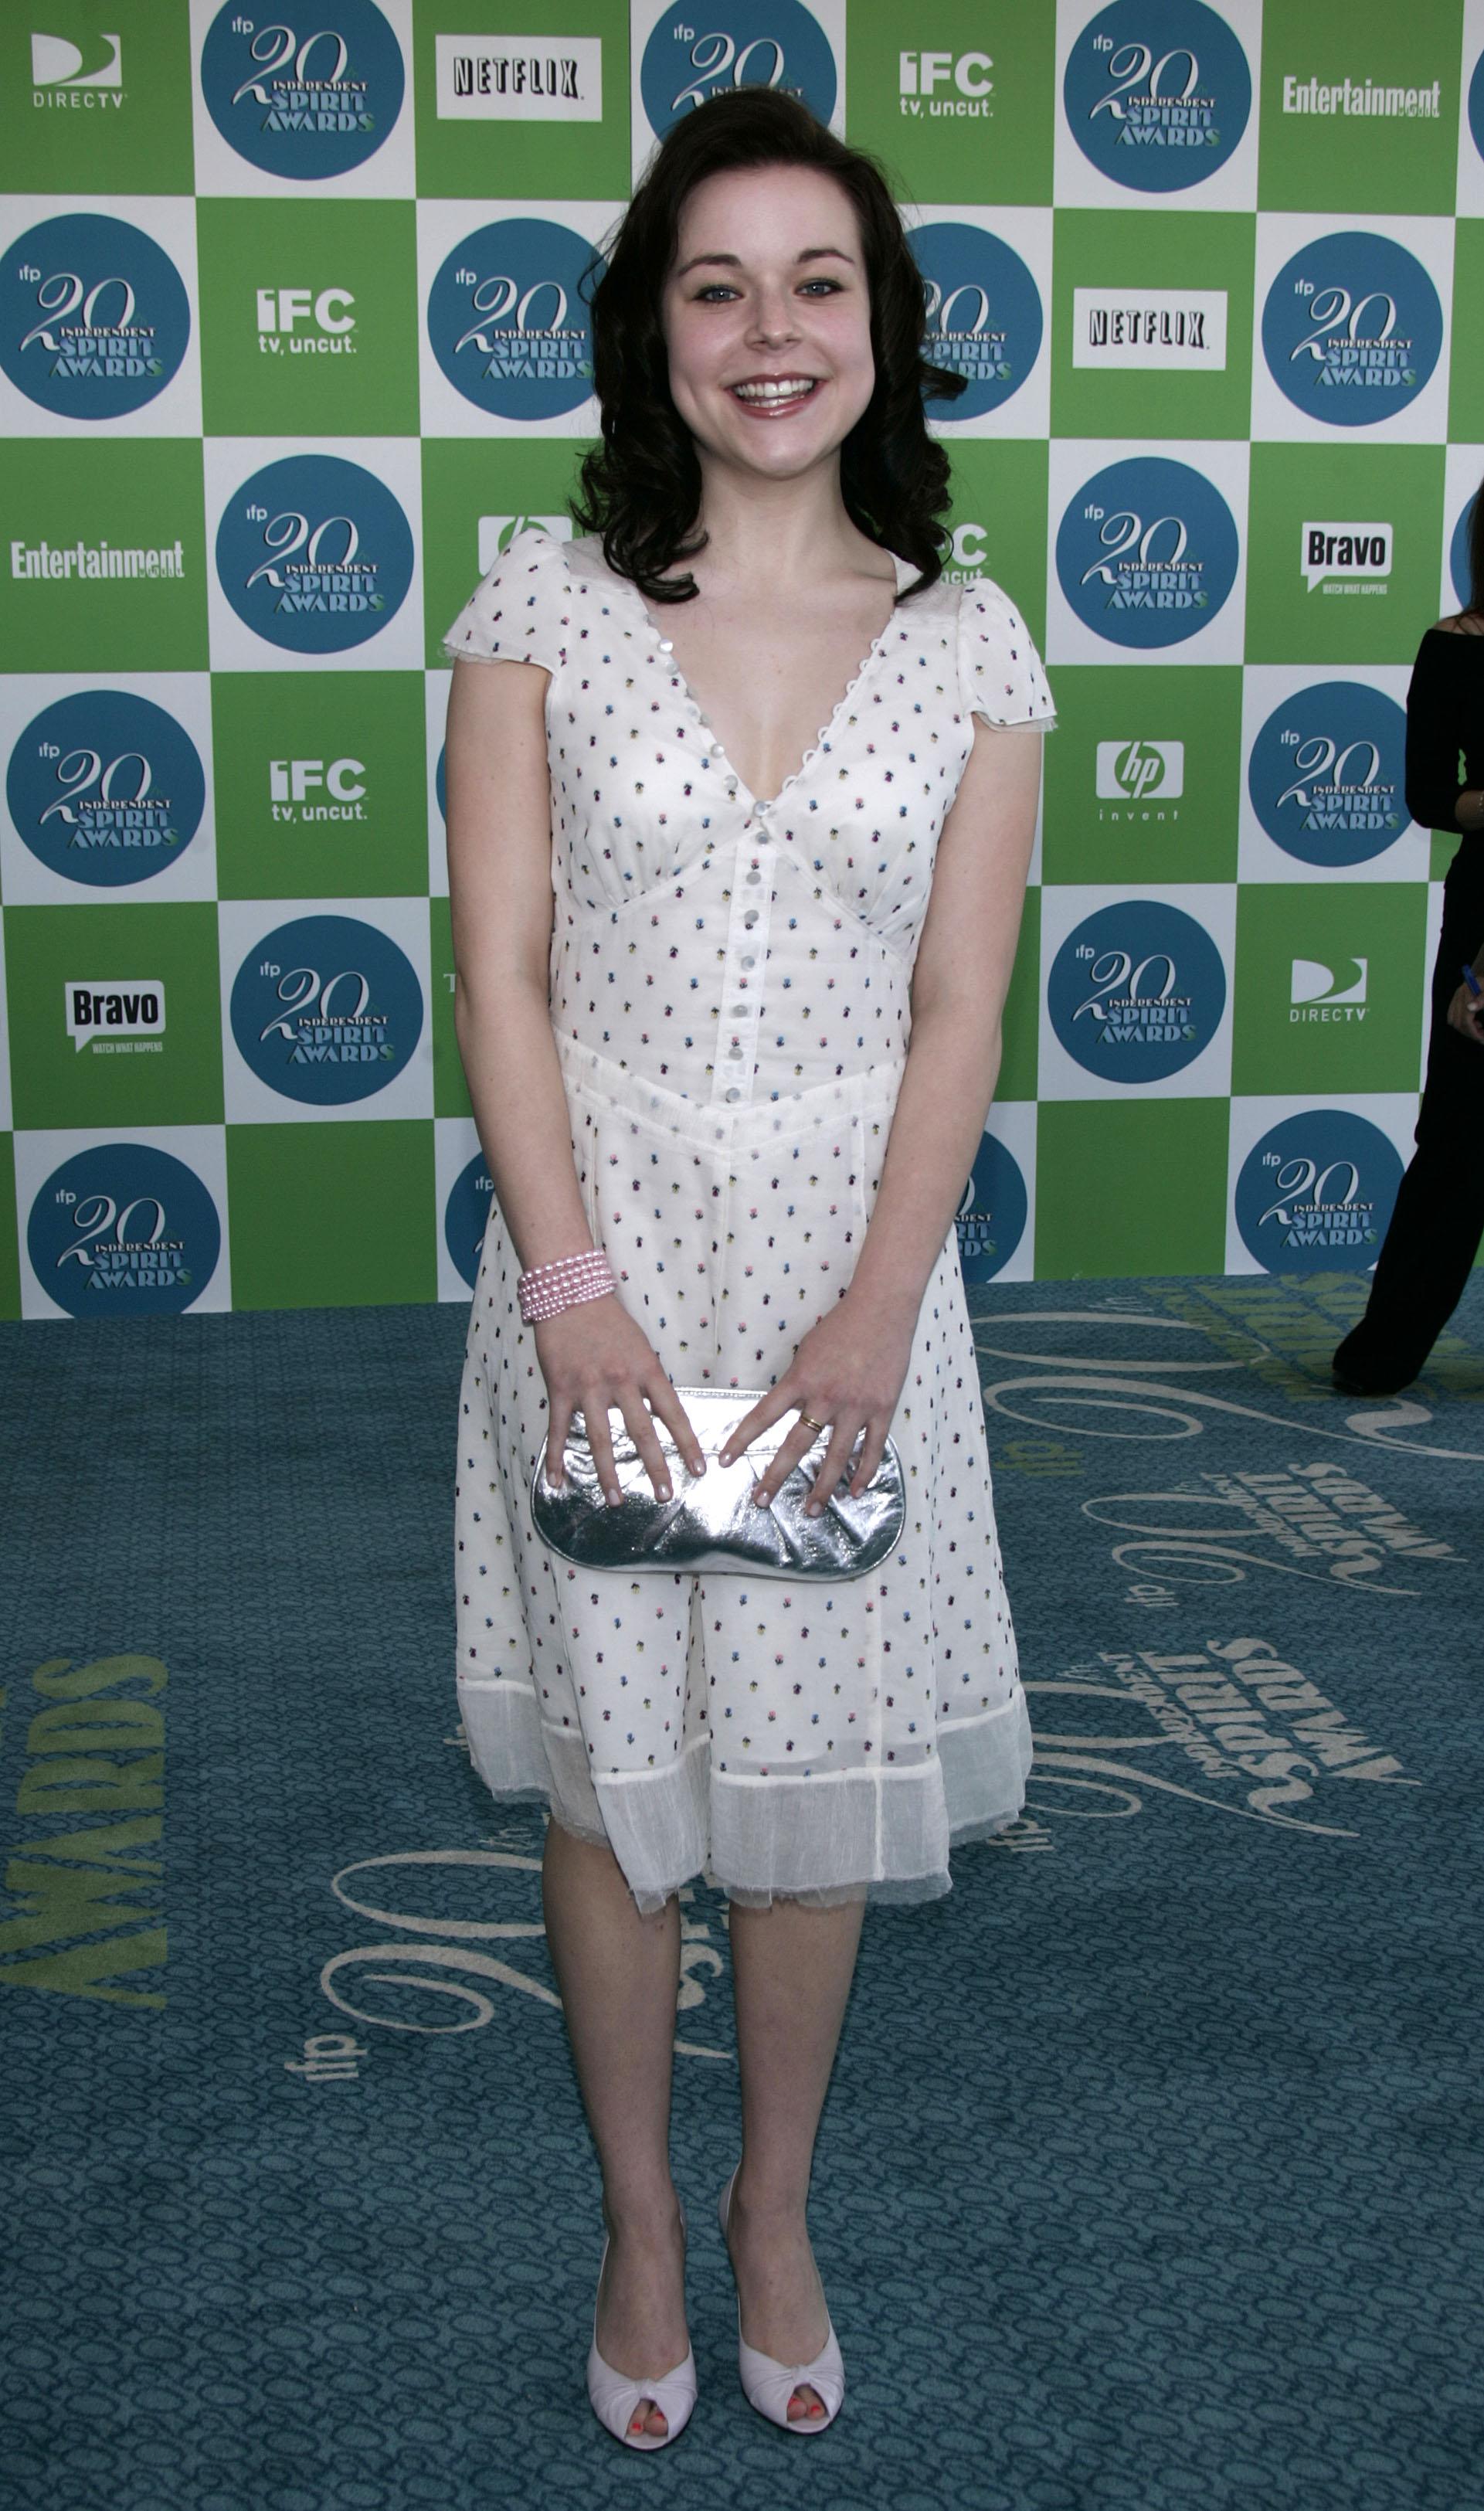 http://pics.wikifeet.com/Tina-Majorino-Feet-135386.jpg